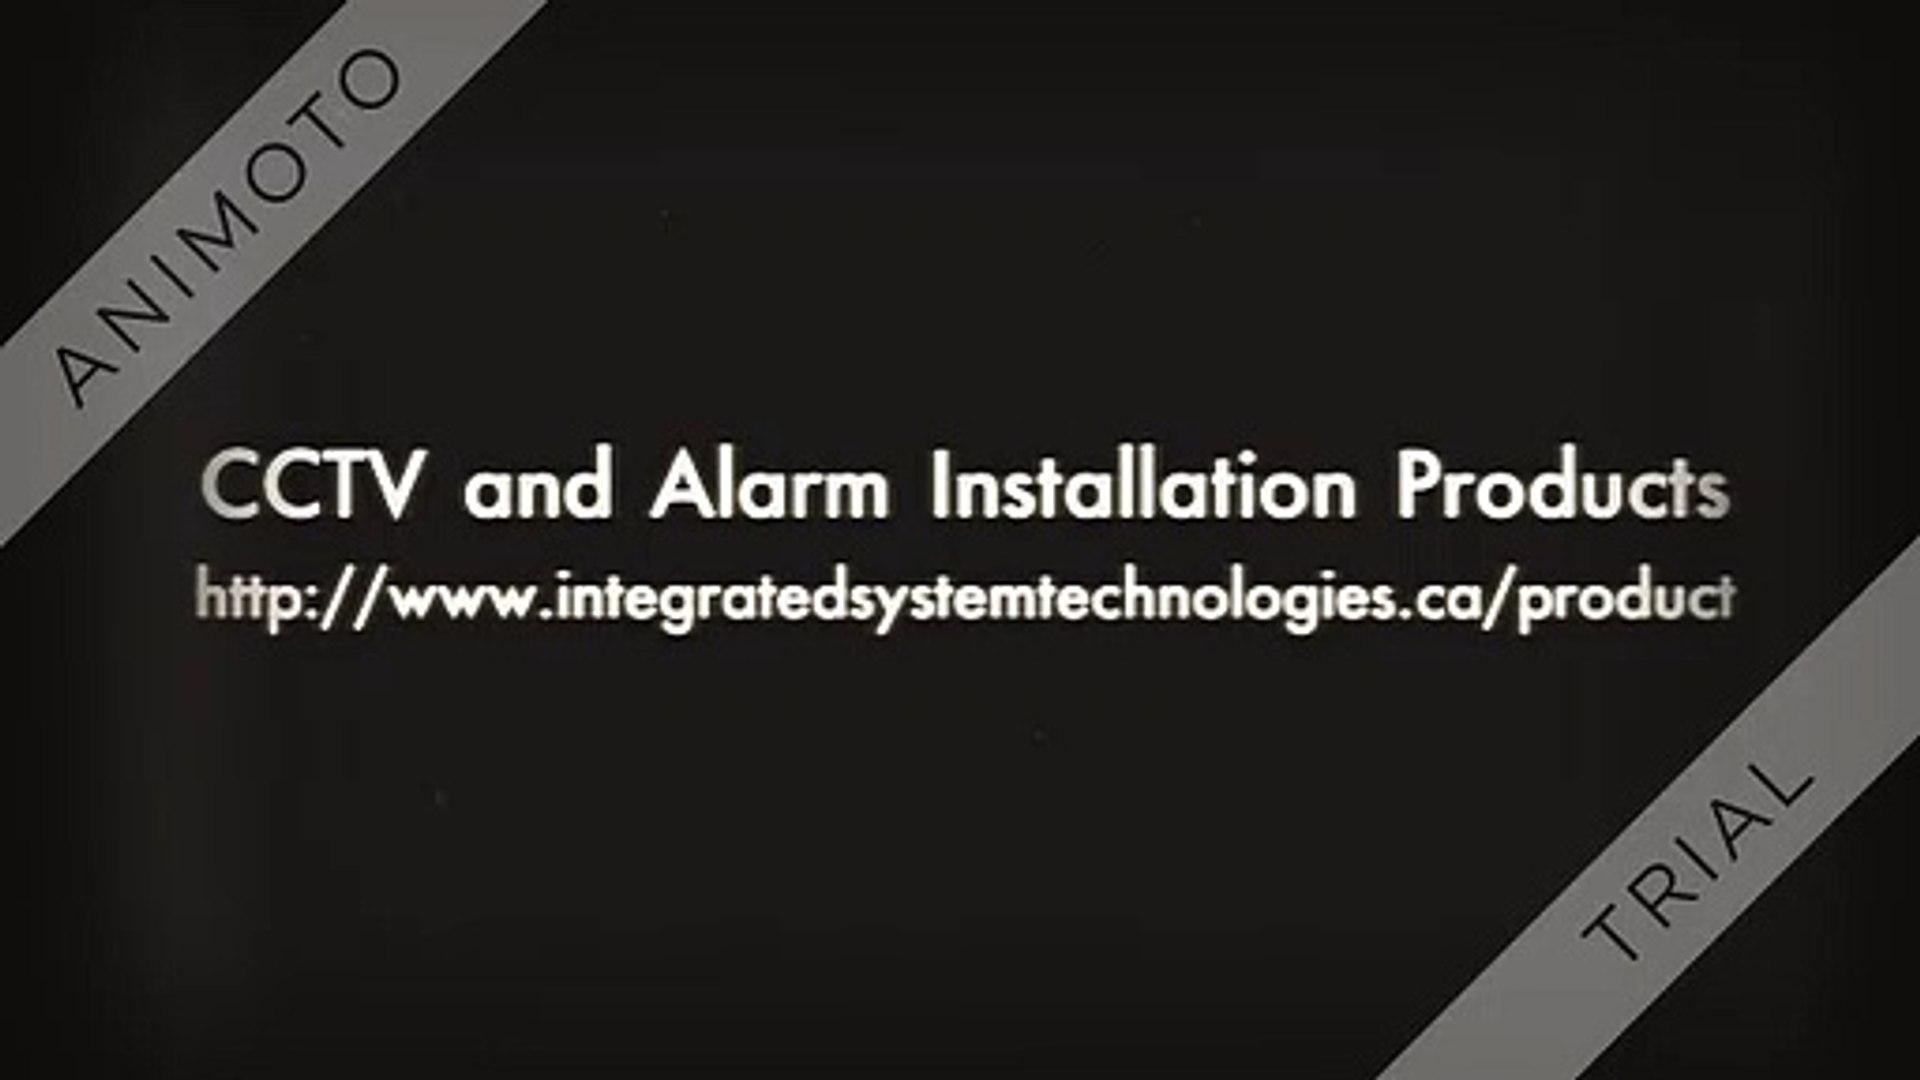 Alarm Installation Products